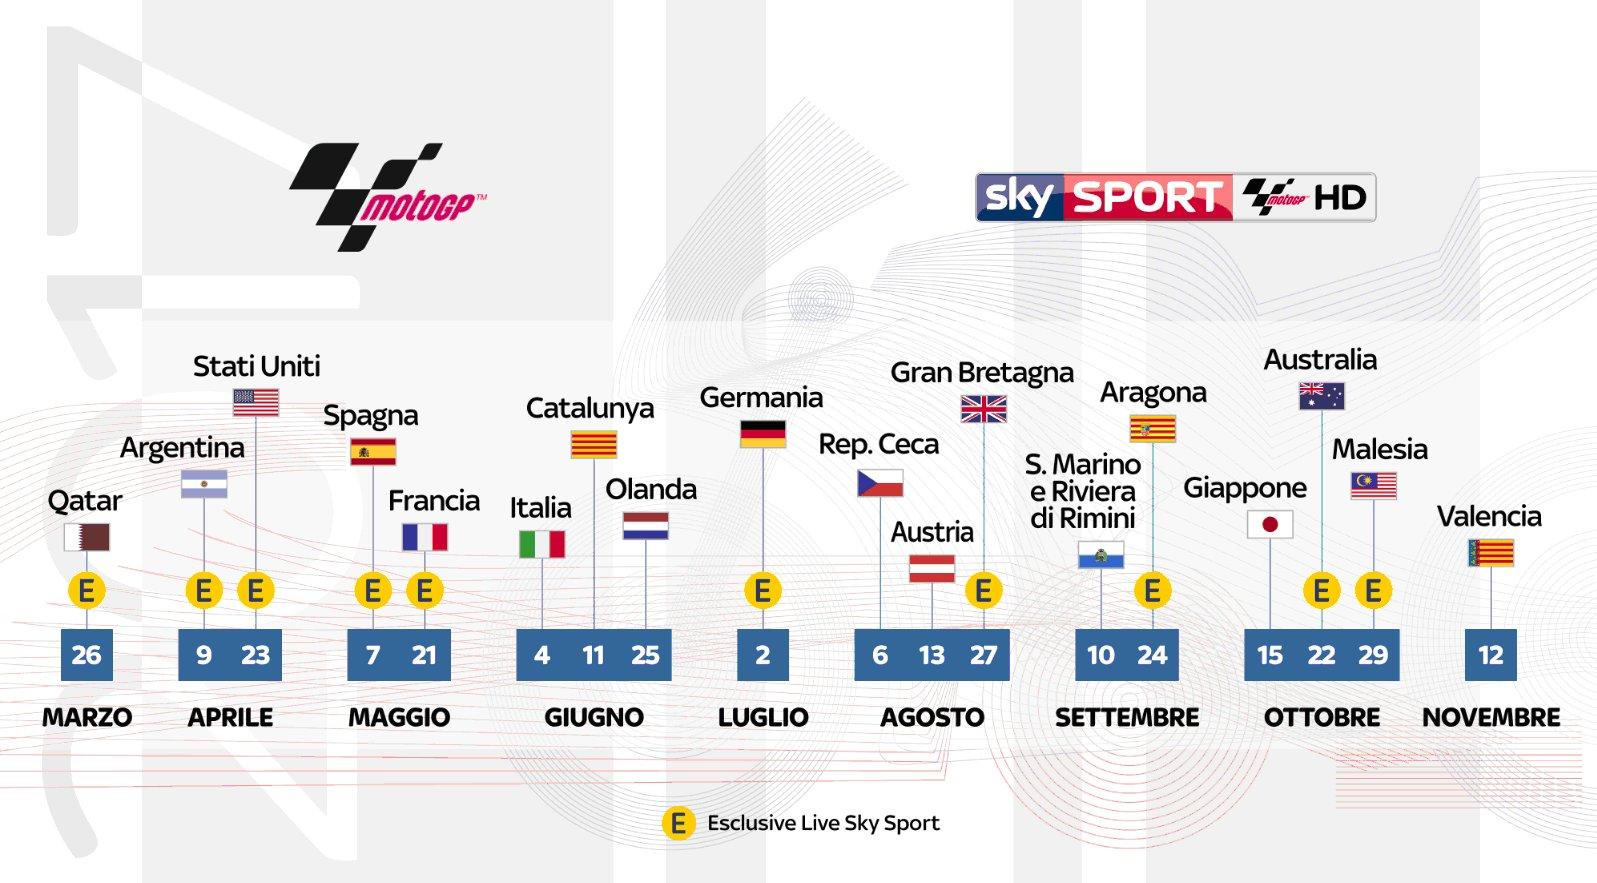 Calendario Motogp 2018 Tv8.Sky Sport Motogp Hd Gp San Marino Palinsesto 7 10